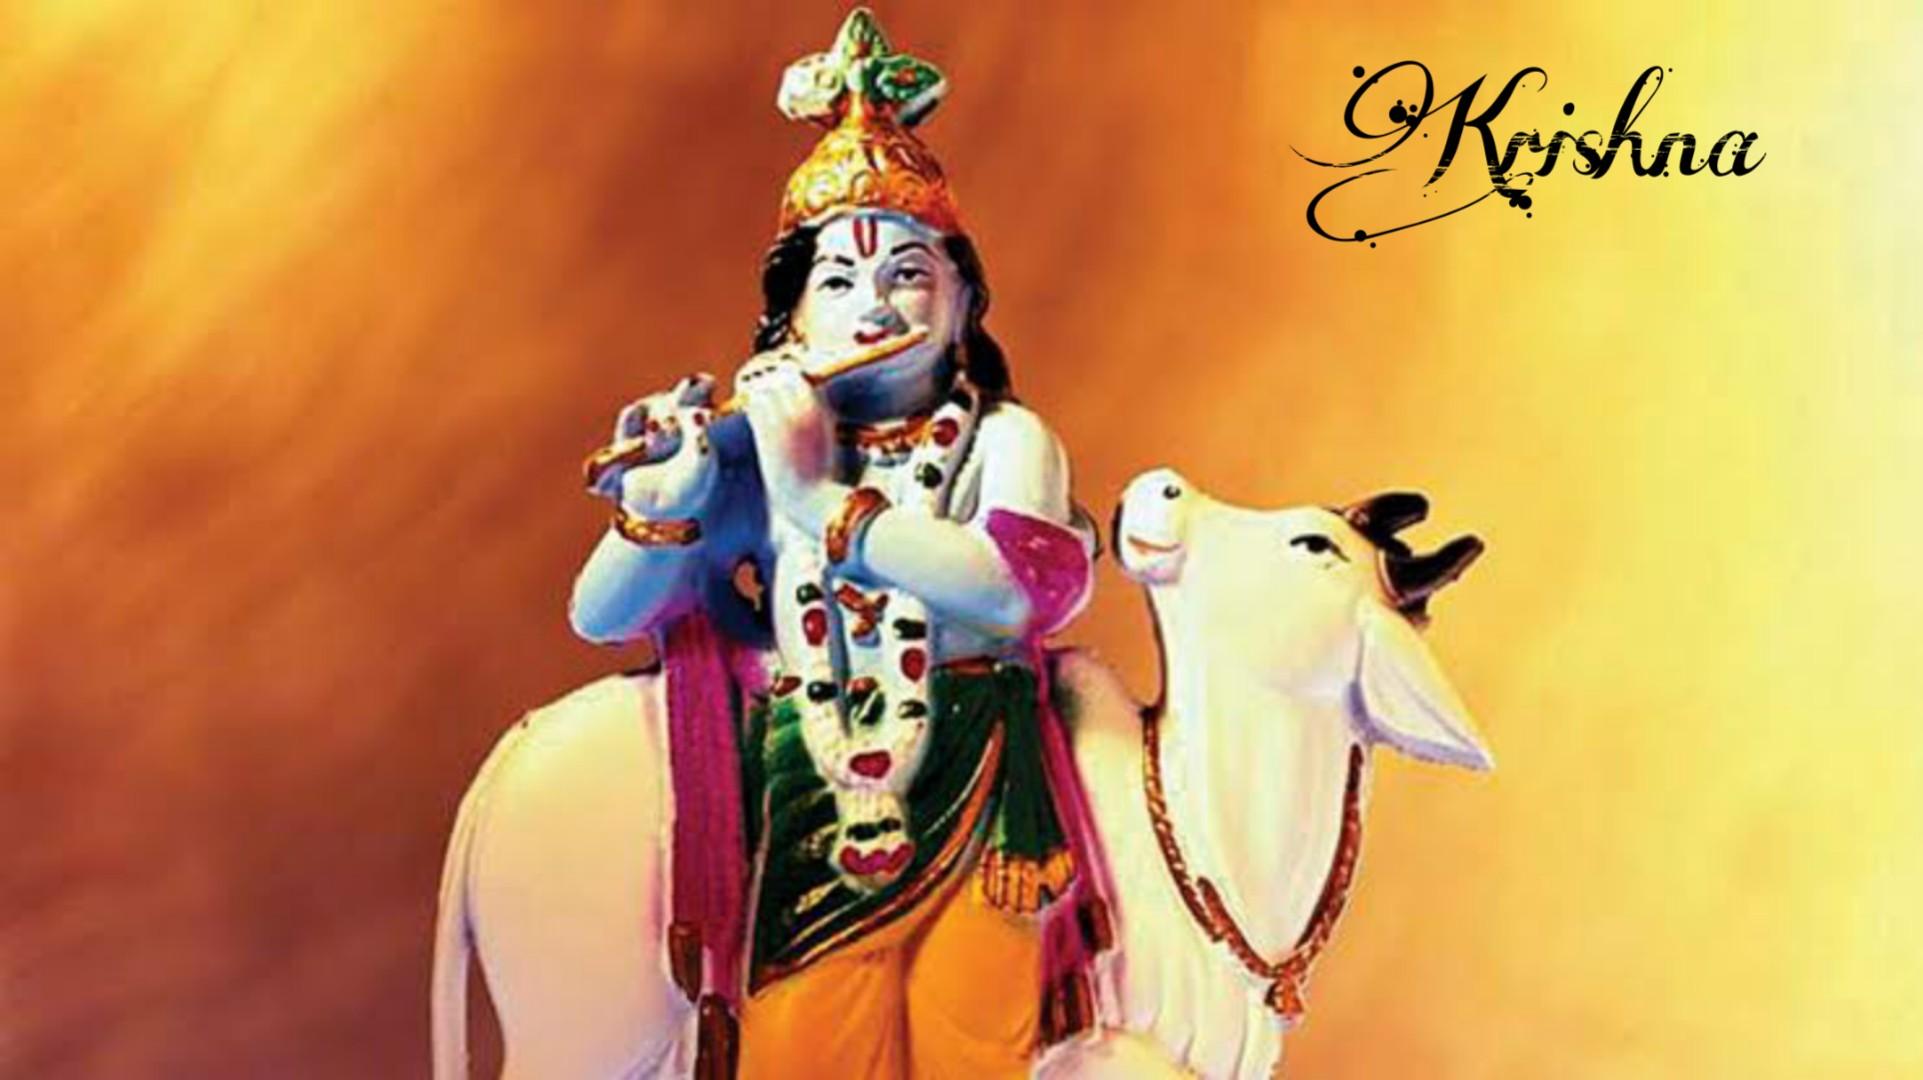 Krishna Images Hd Download - Lord Krishna With Garland - HD Wallpaper